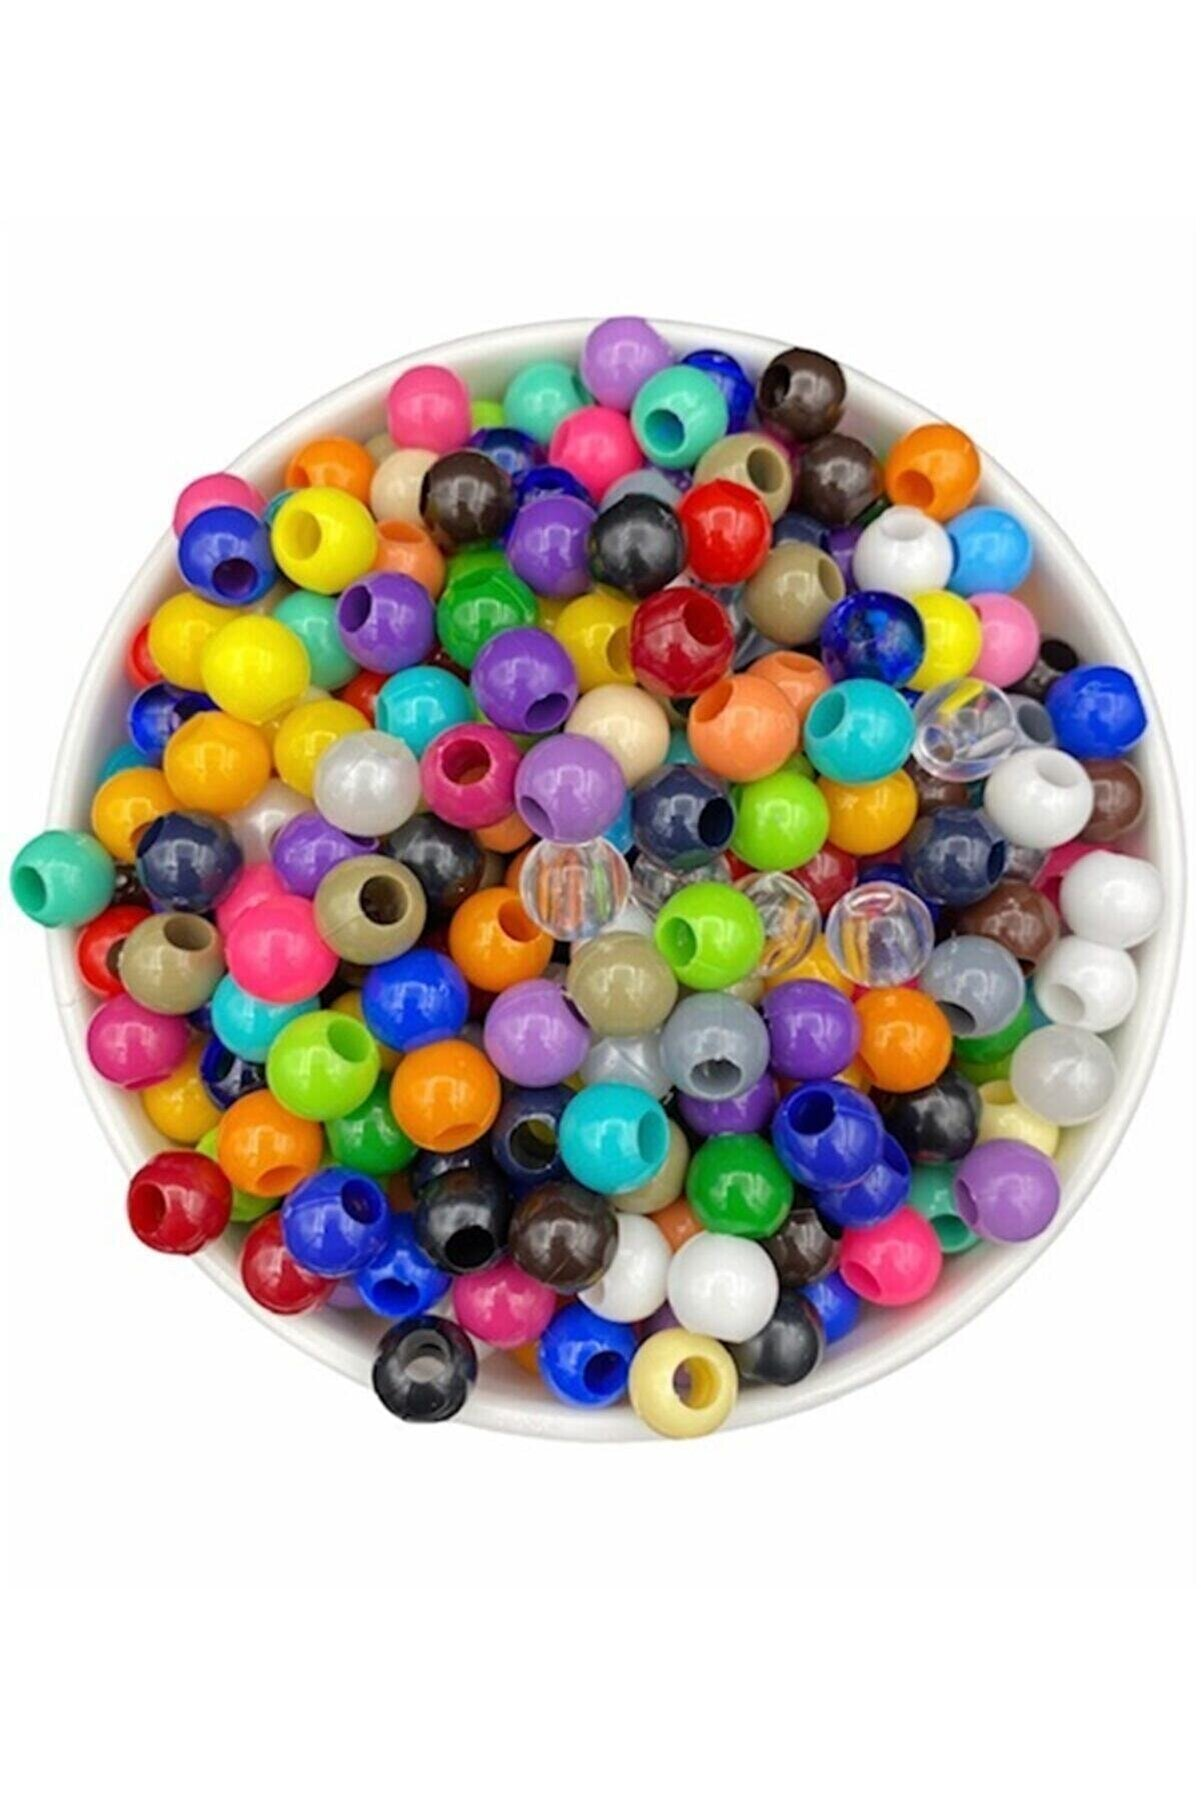 Hedef Bijuteri 10mm Karışık Renkli Plastik Boncuk,renkli Geniş Delik Makrome Boncuğu (100gr,~200 Adet Boncuk)